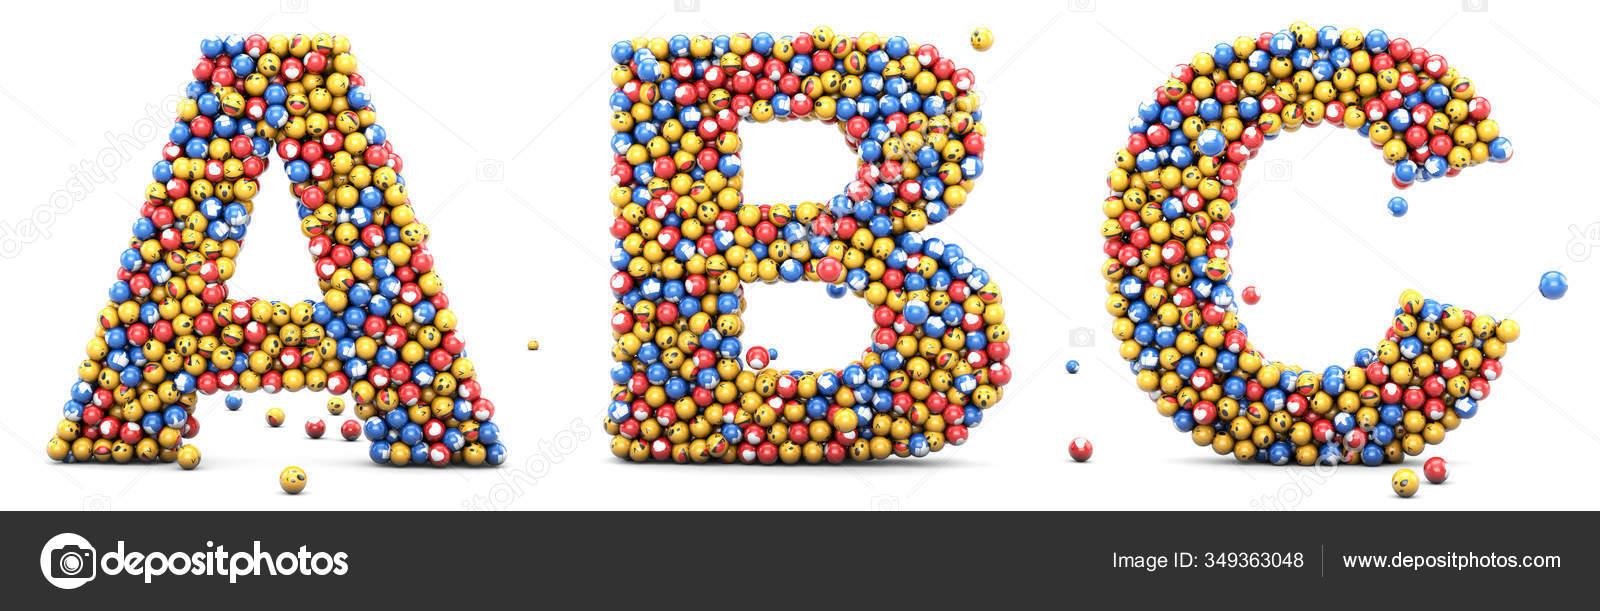 Emoji Reactions Letters Alphabet Emoticons Set Social Medias Social Networks Stock Photo C Wesleyyaya 349363048